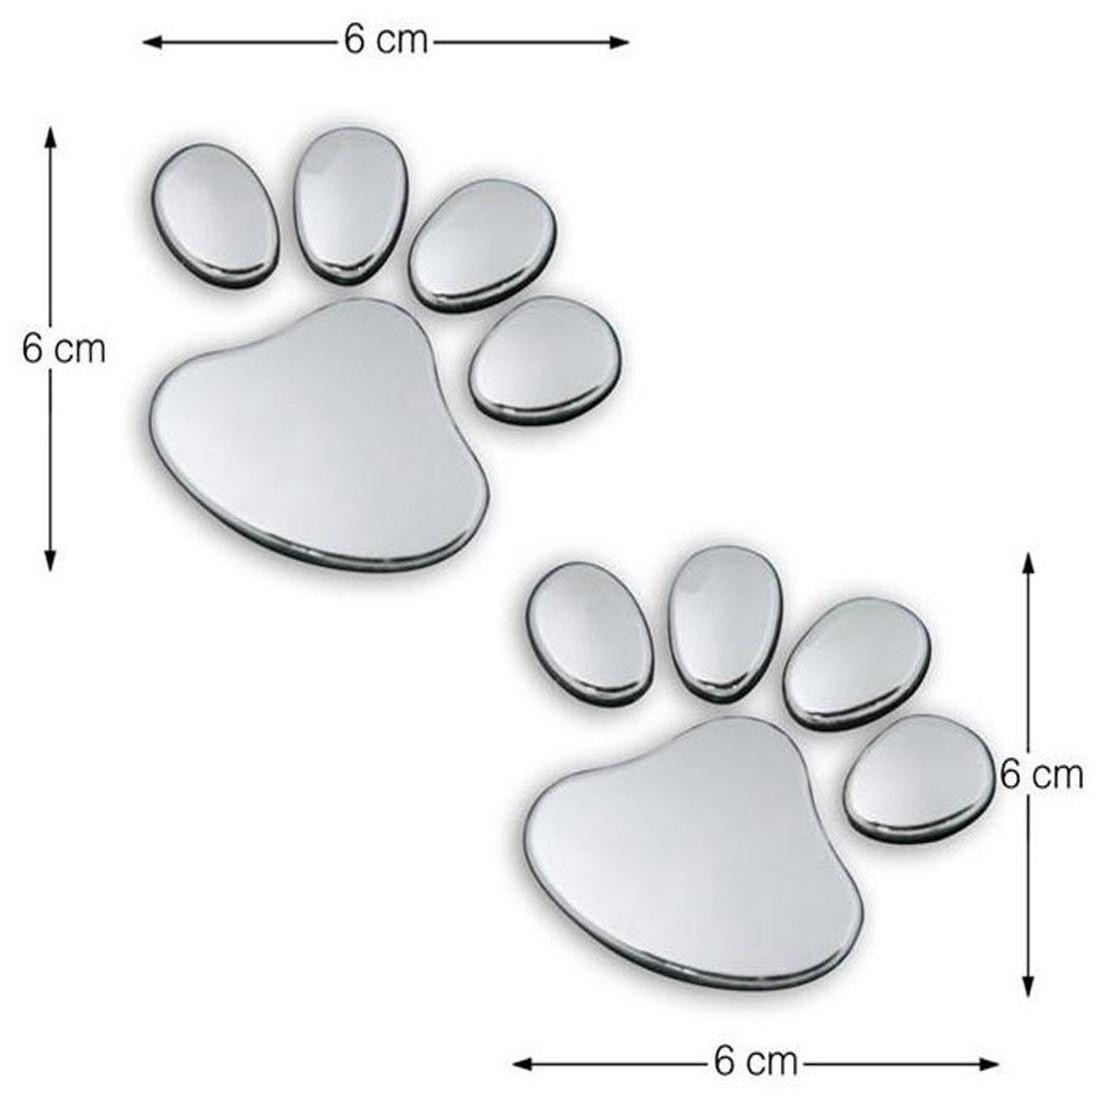 Dewtreetali Car Sticker Cool Design Paw  3D Animal Dog Cat Bear Foot Prints Footprint 3M Decal Car Stickers Pair Silver Gold